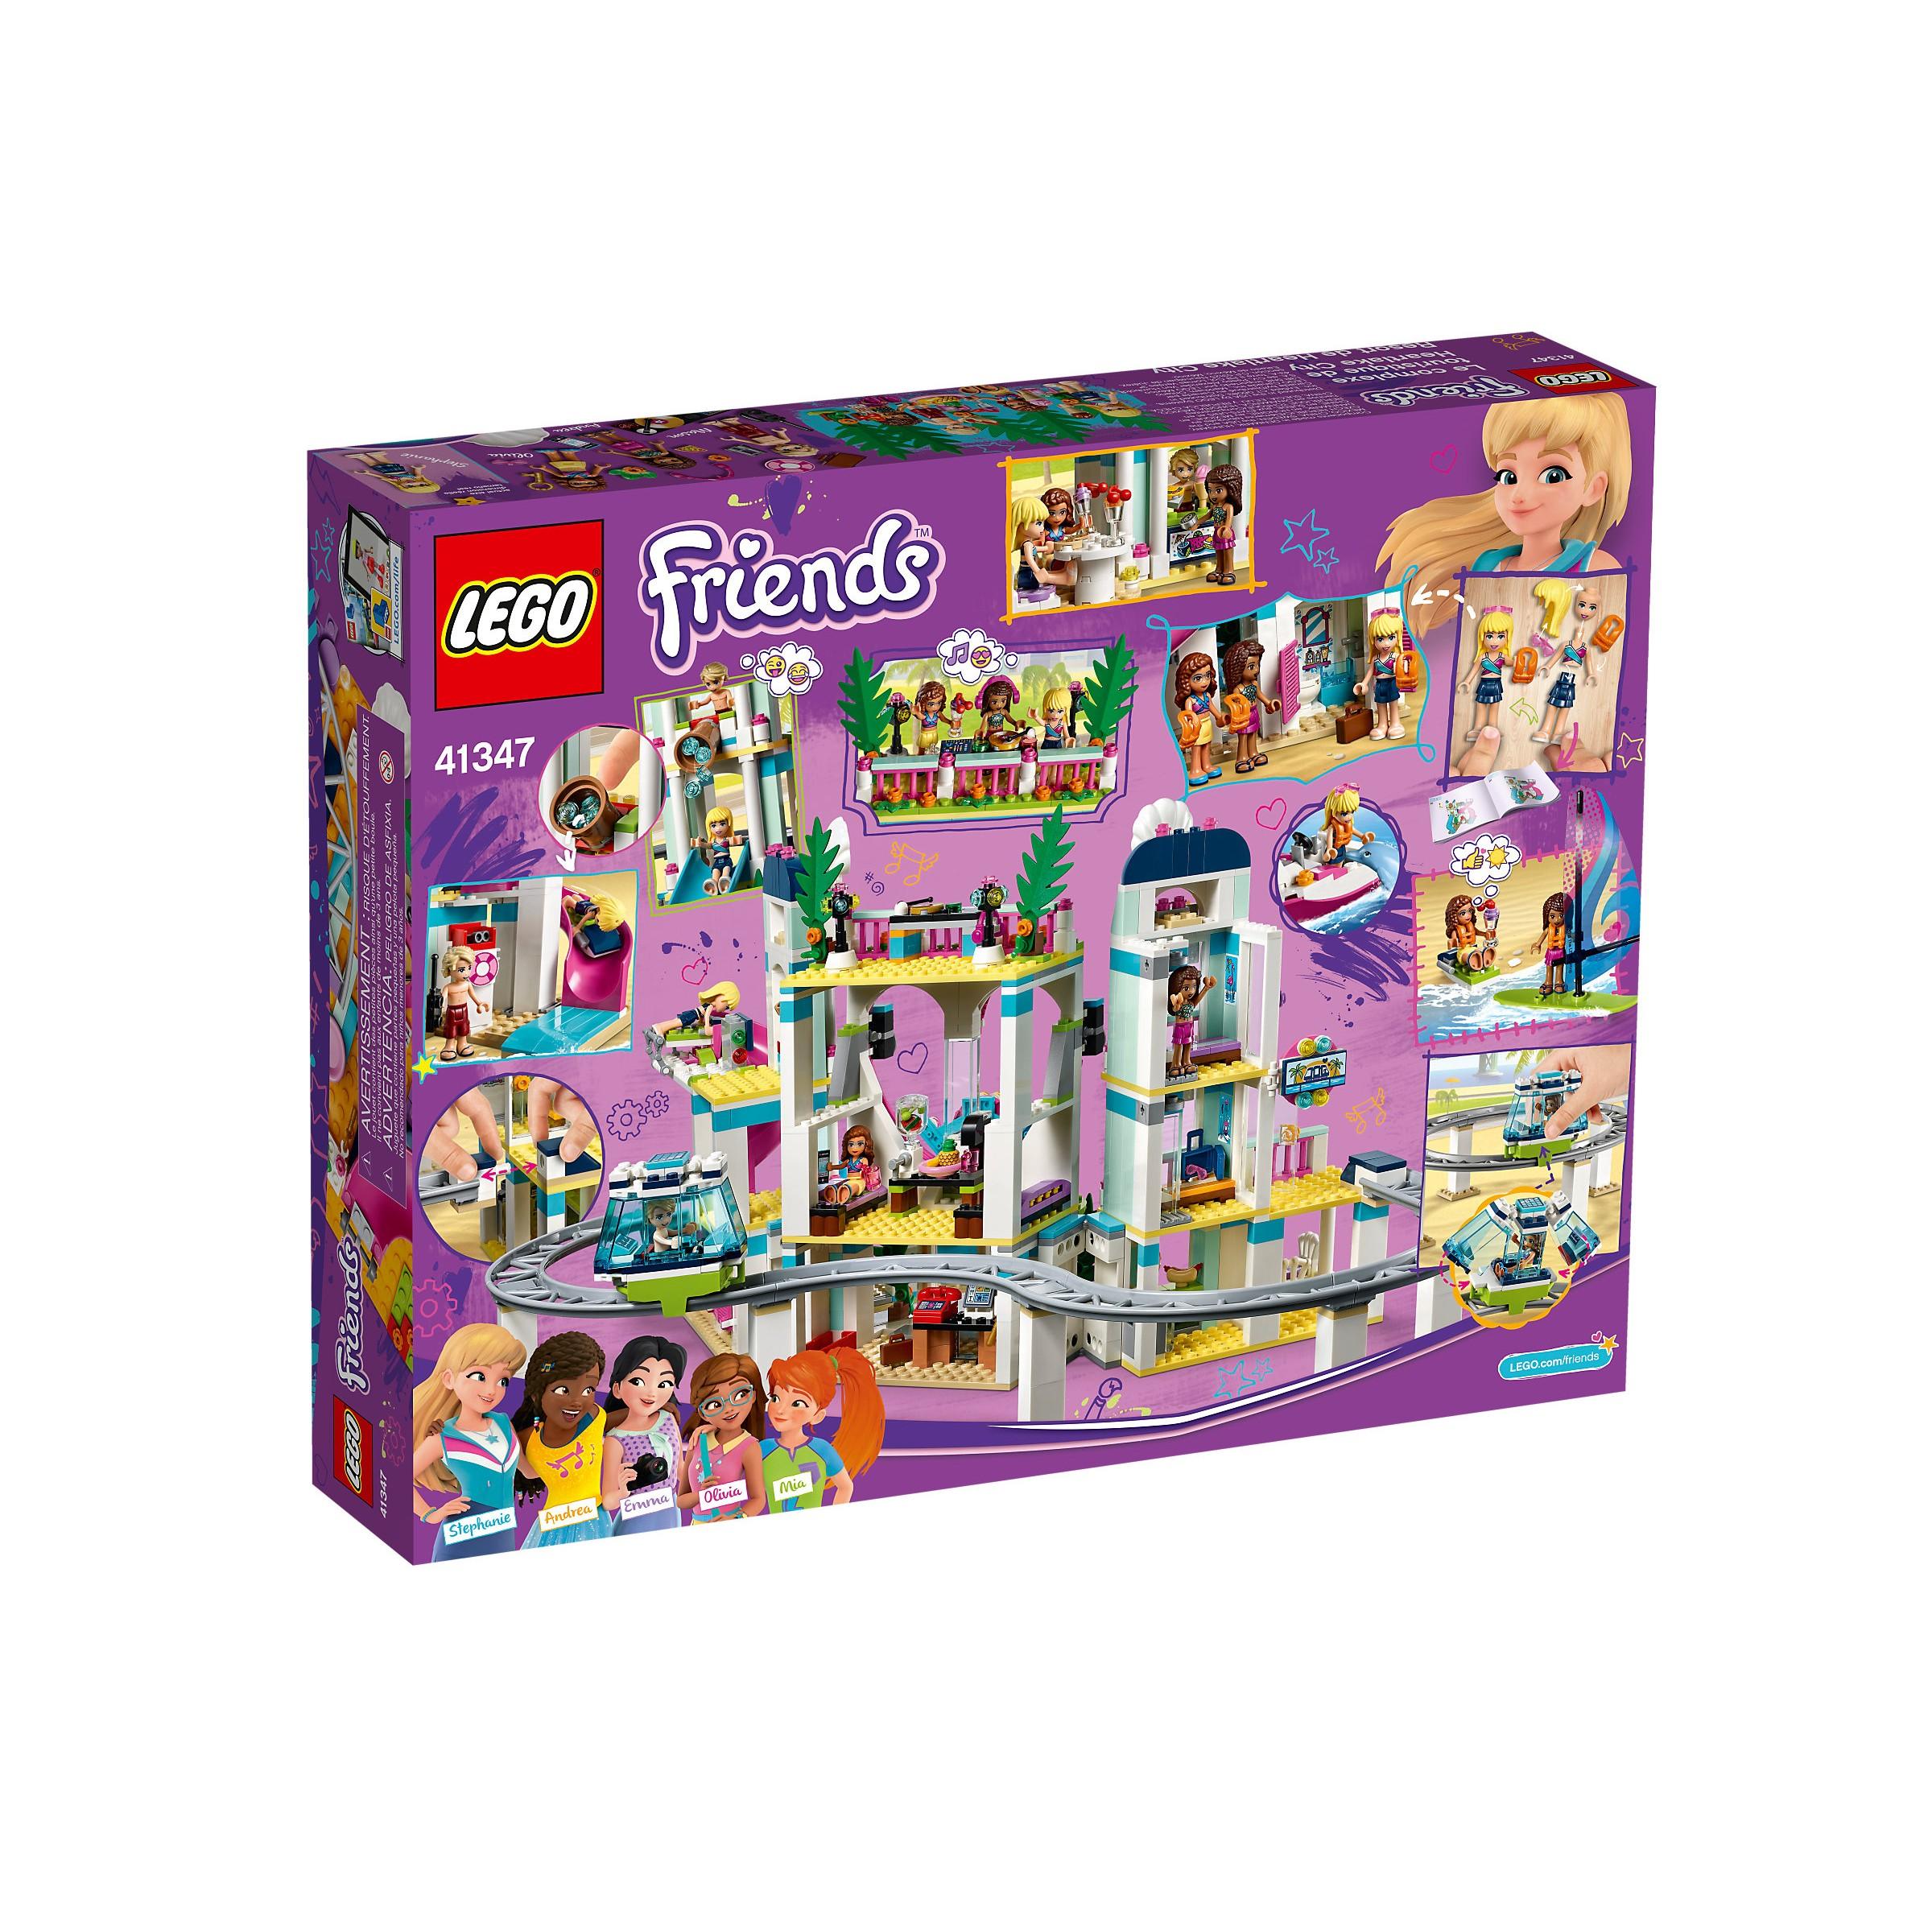 LEGO 41347 Friends Heartlake City Resort at Toys R Us